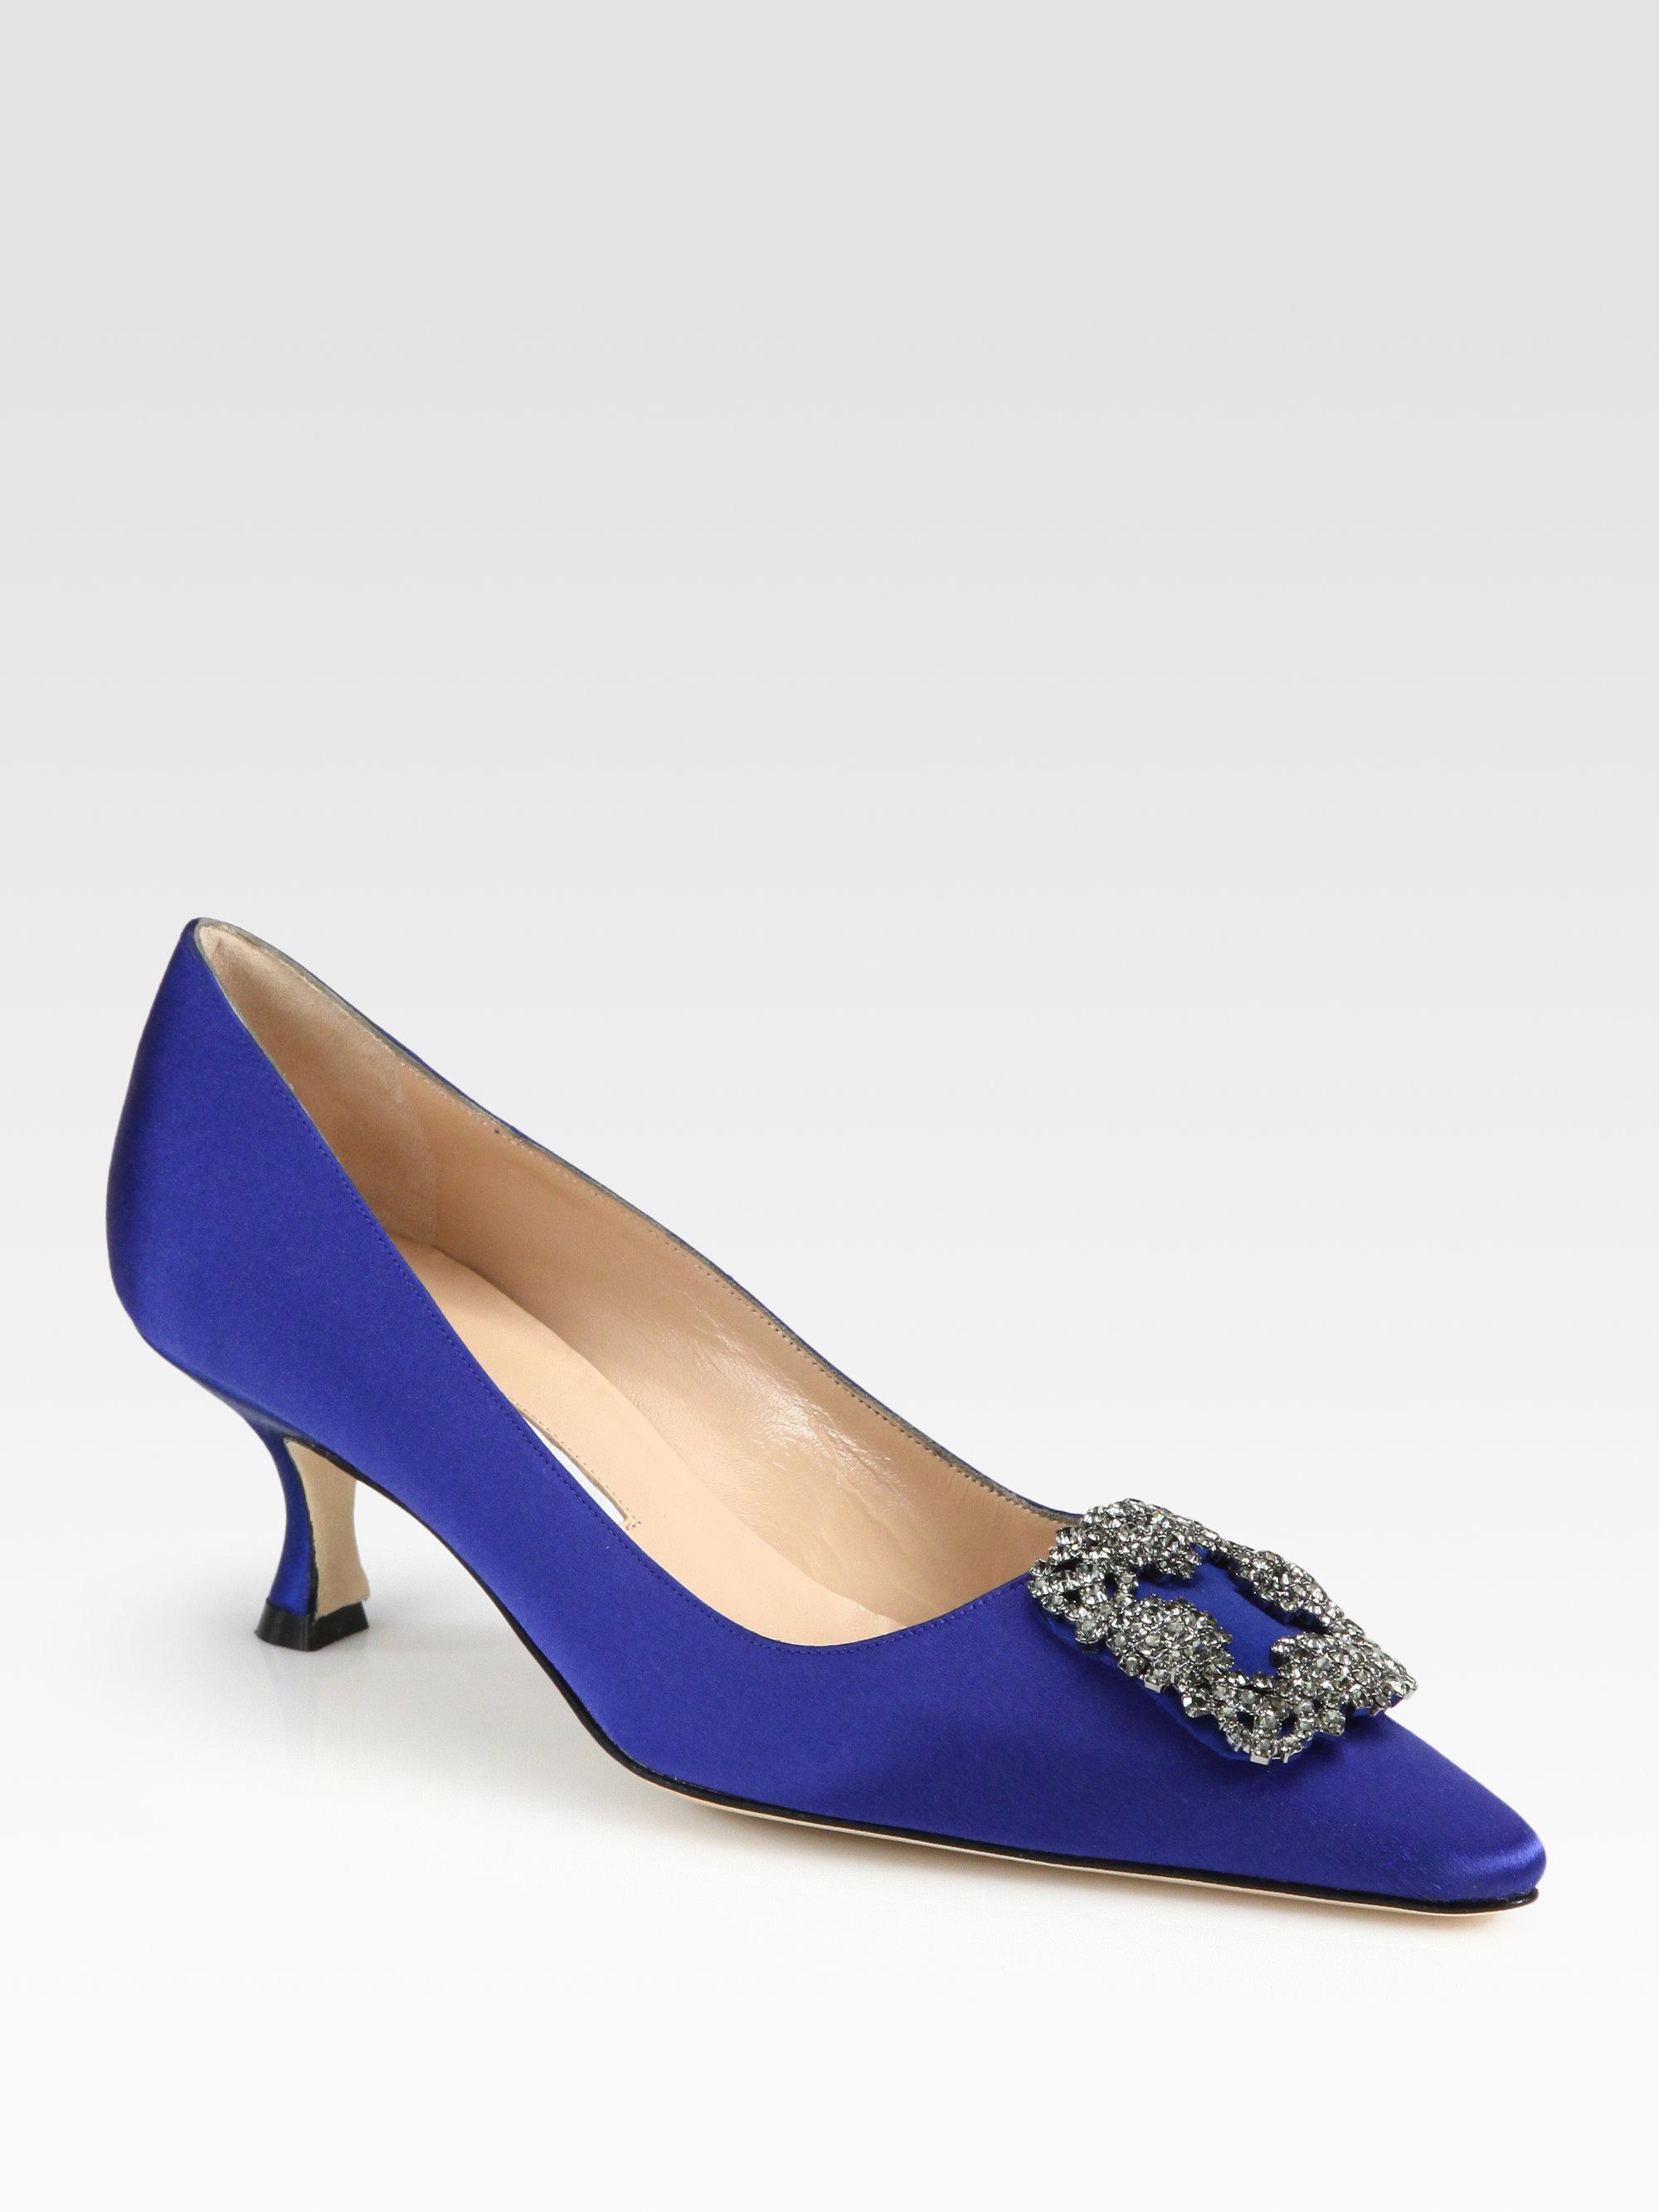 Manolo blahnik hangisi 50 satin pumps in blue lyst for Shoe designer manolo blahnik